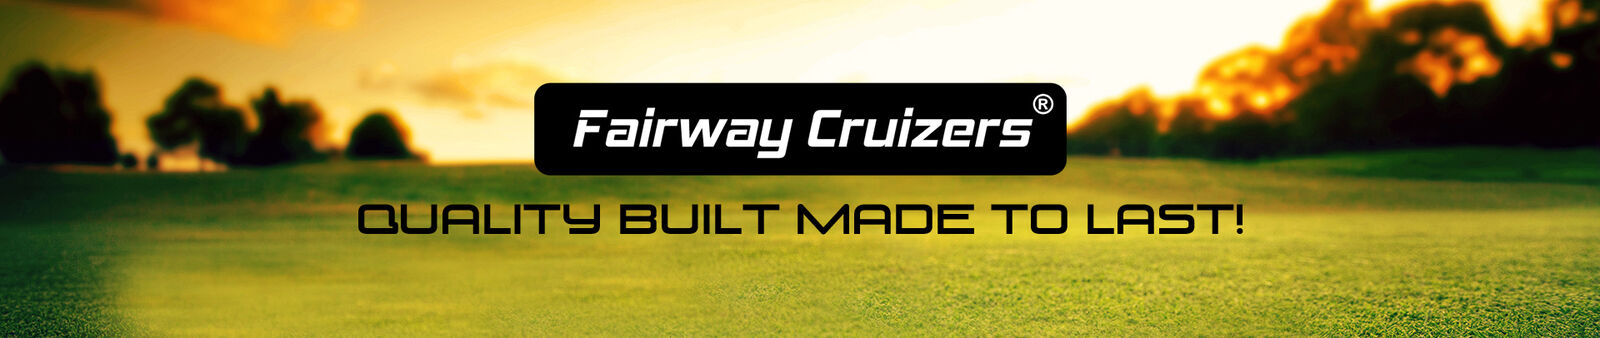 fairwaycruizers